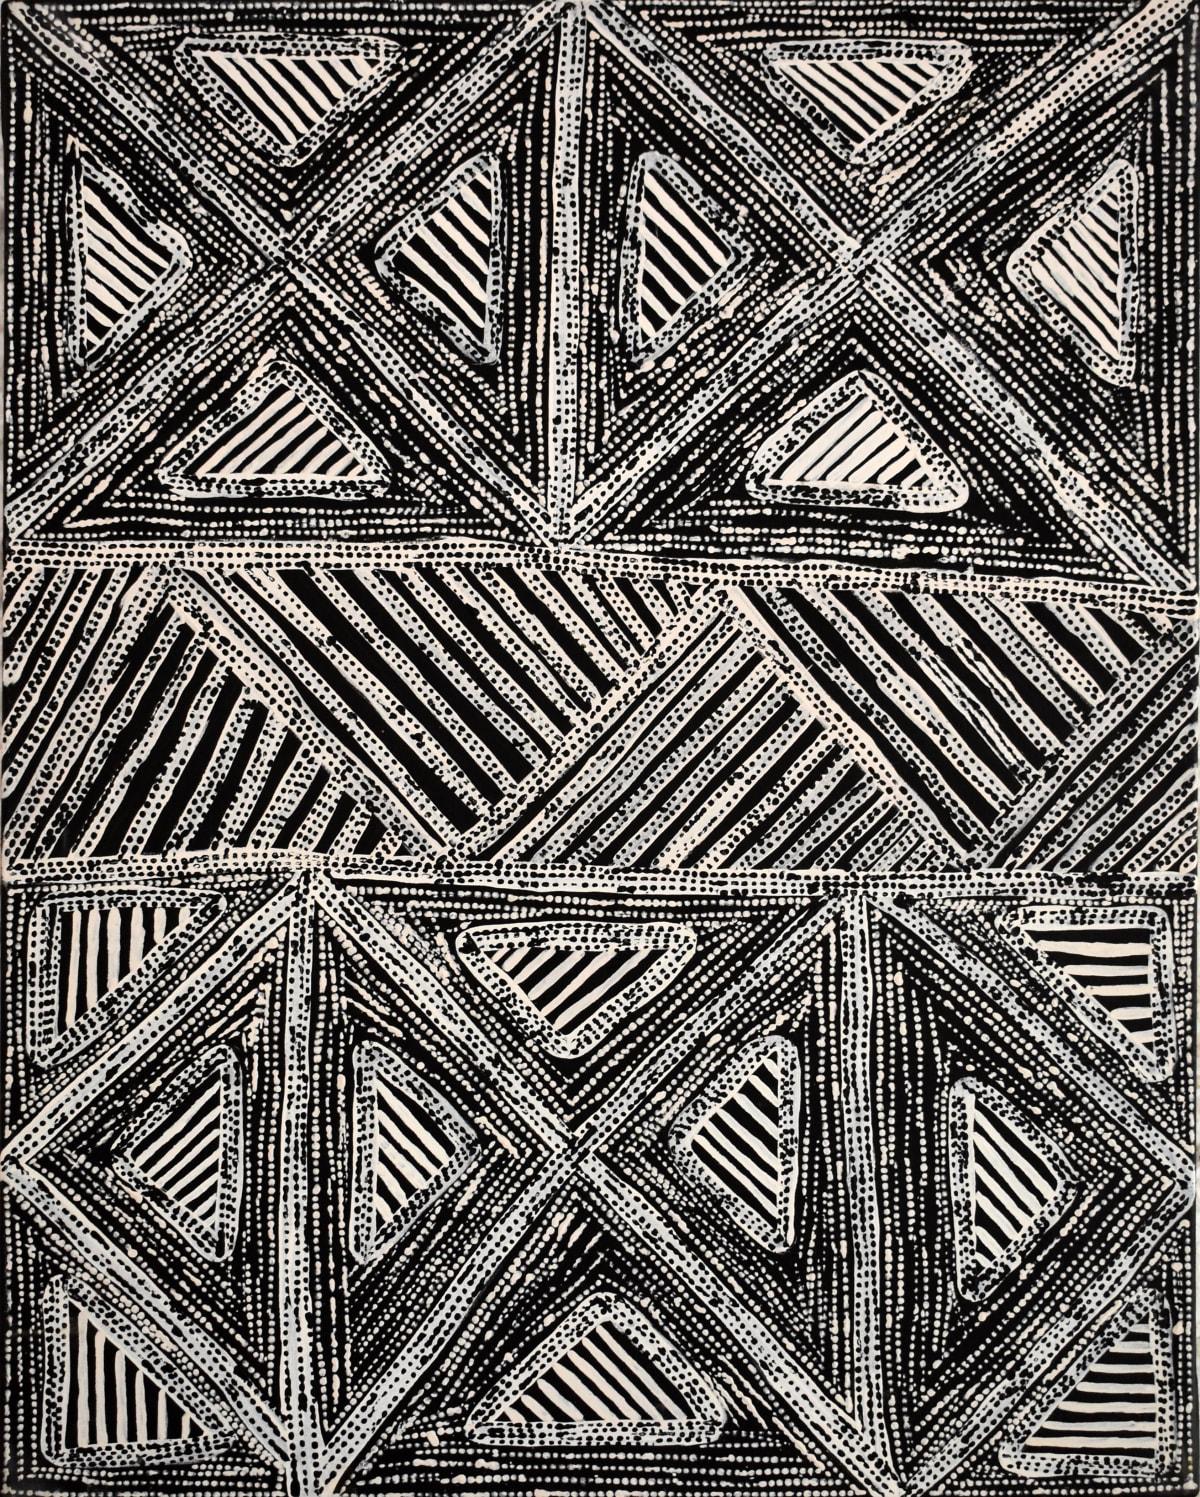 Michelle Woody Minnapinni Jilamara natural ochres on canvas 70 x 90 cm